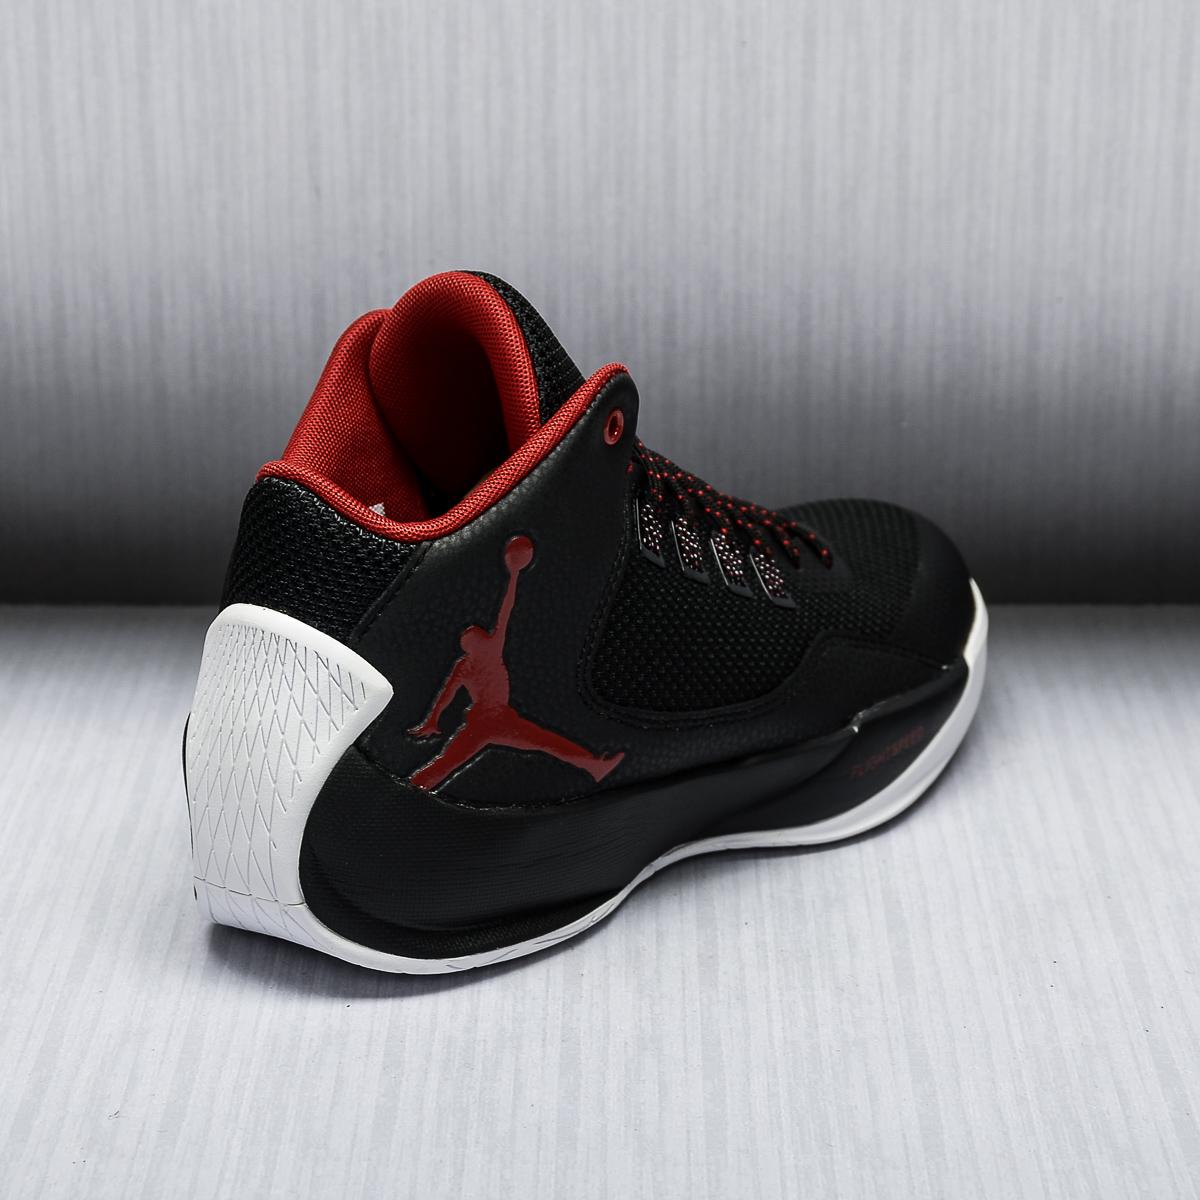 792d9e9e7bfc Air Jordans Black And Pink